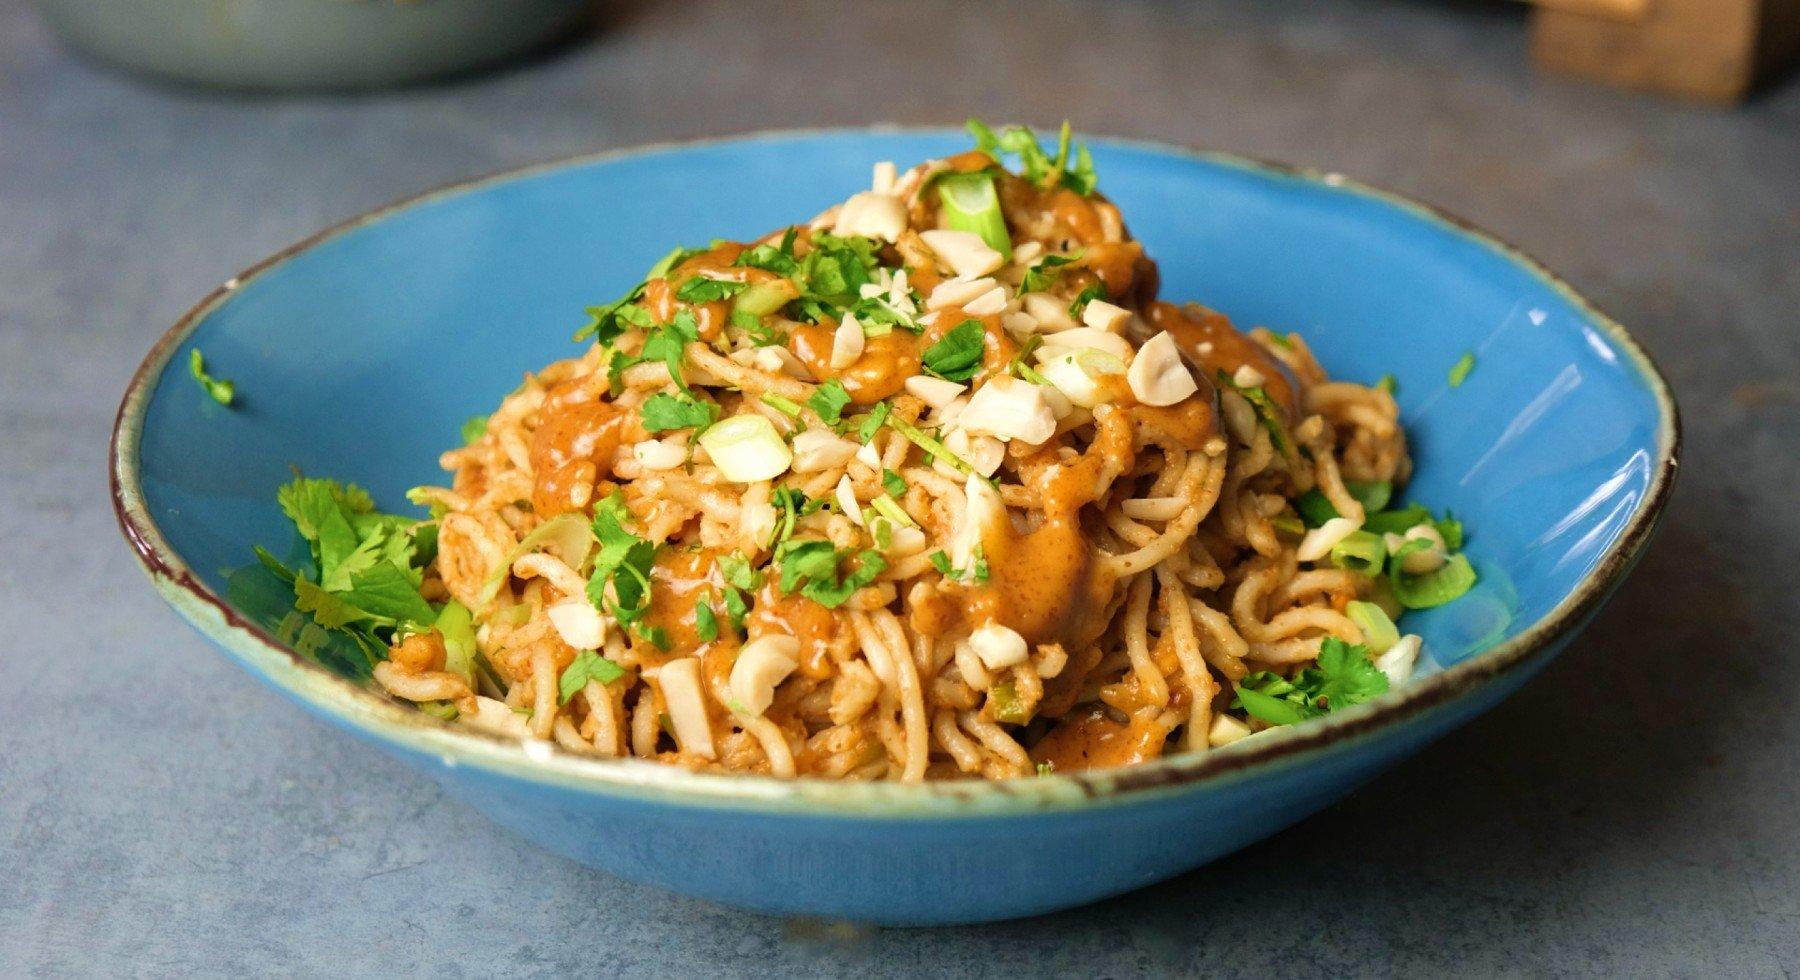 Creamy Peanut Butter Noodles   15-Minute Vegan-Friendly Dinner